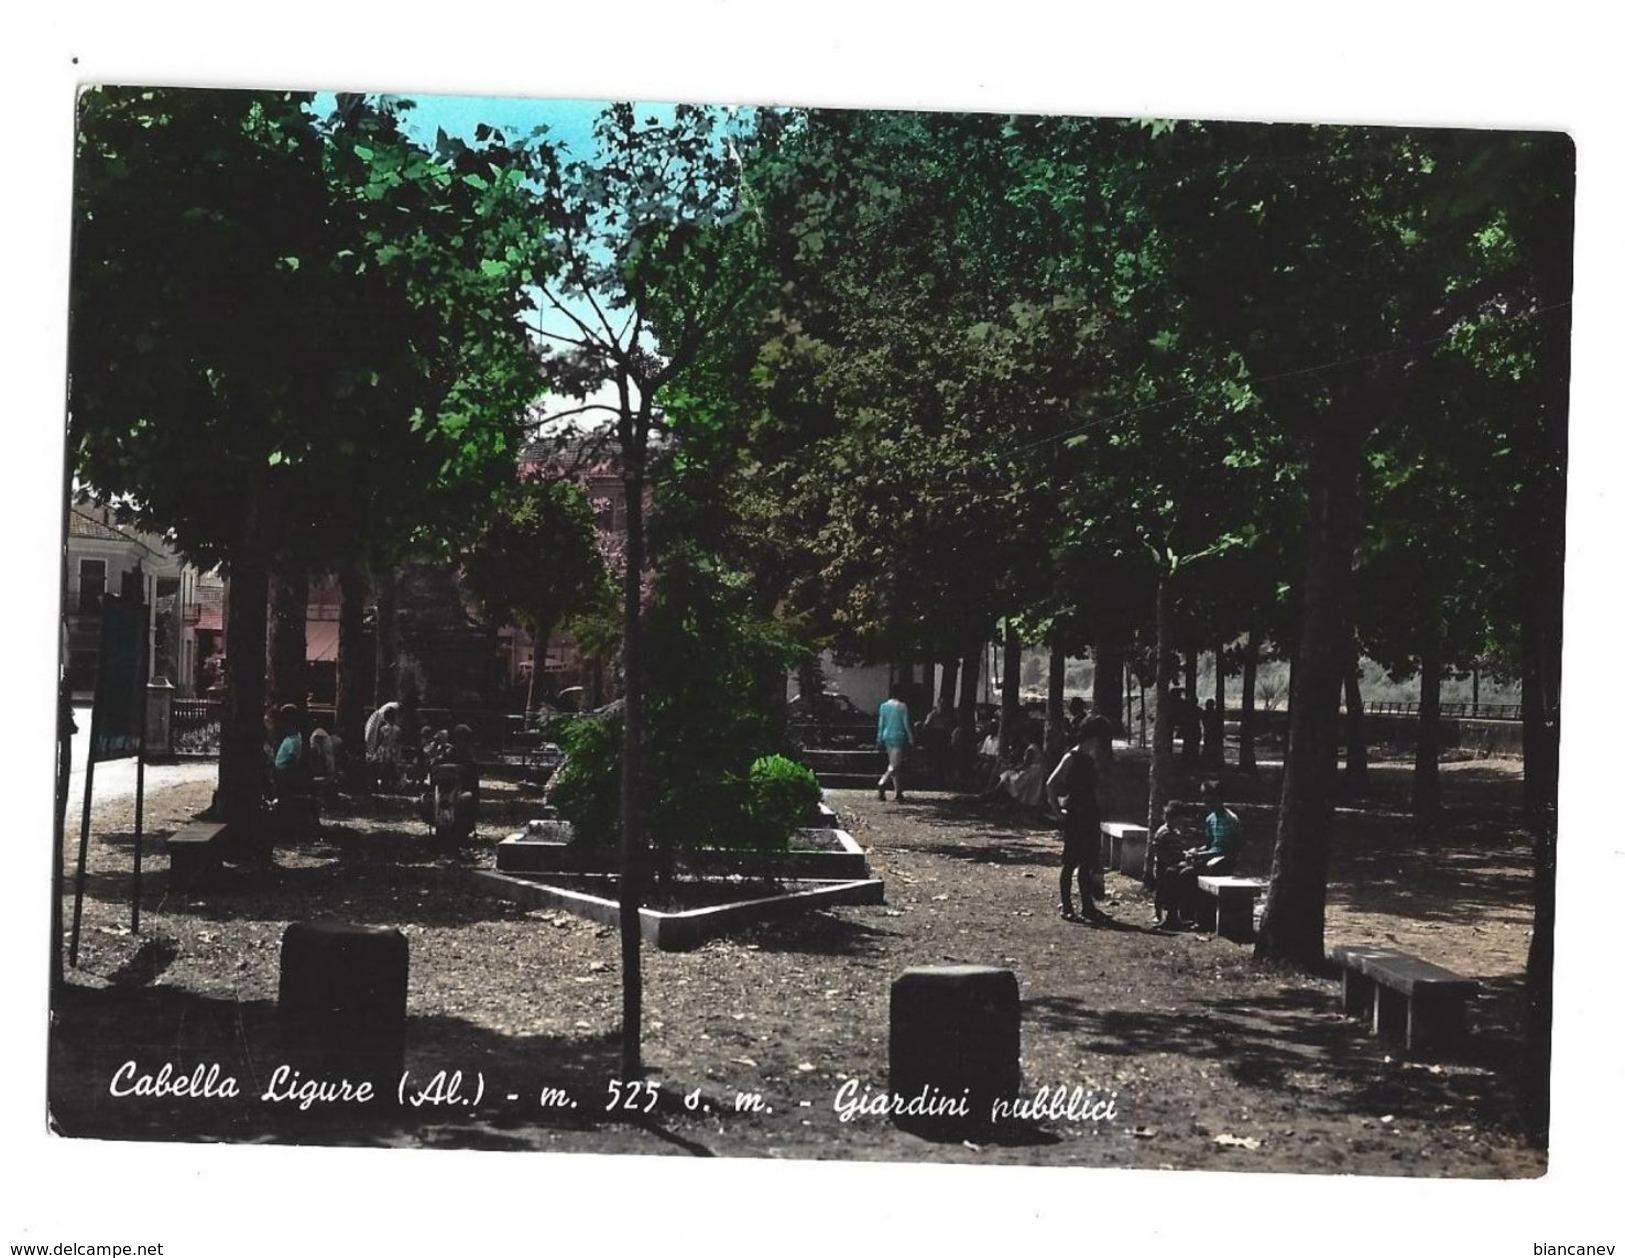 CARTOLINA DI CABELLA LIGURE - ALESSANDRIA - 1 - Alessandria